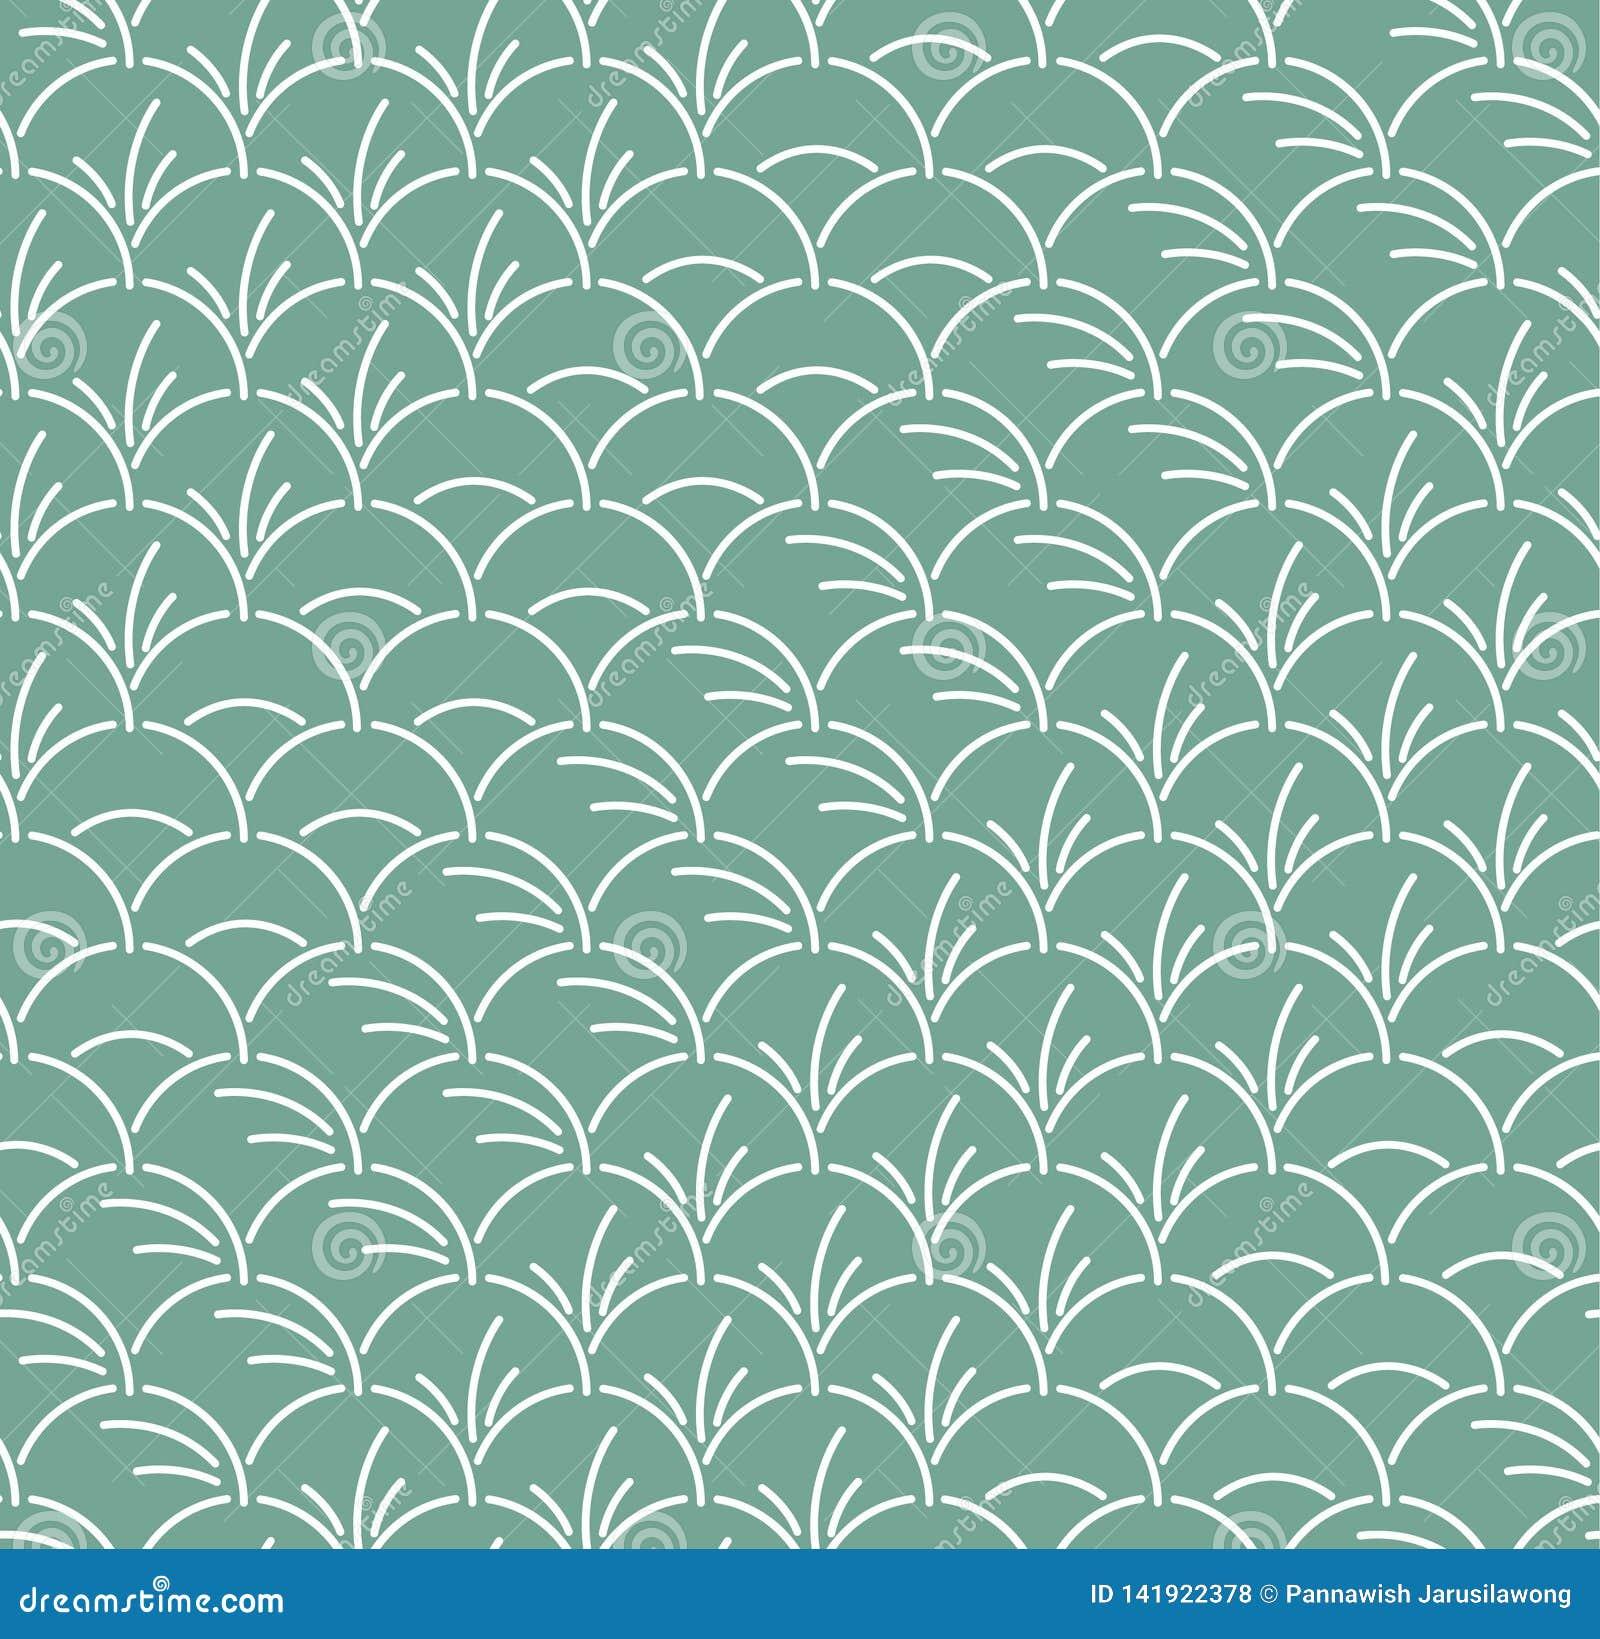 Folha semicircular japonesa Art Seamless Pattern